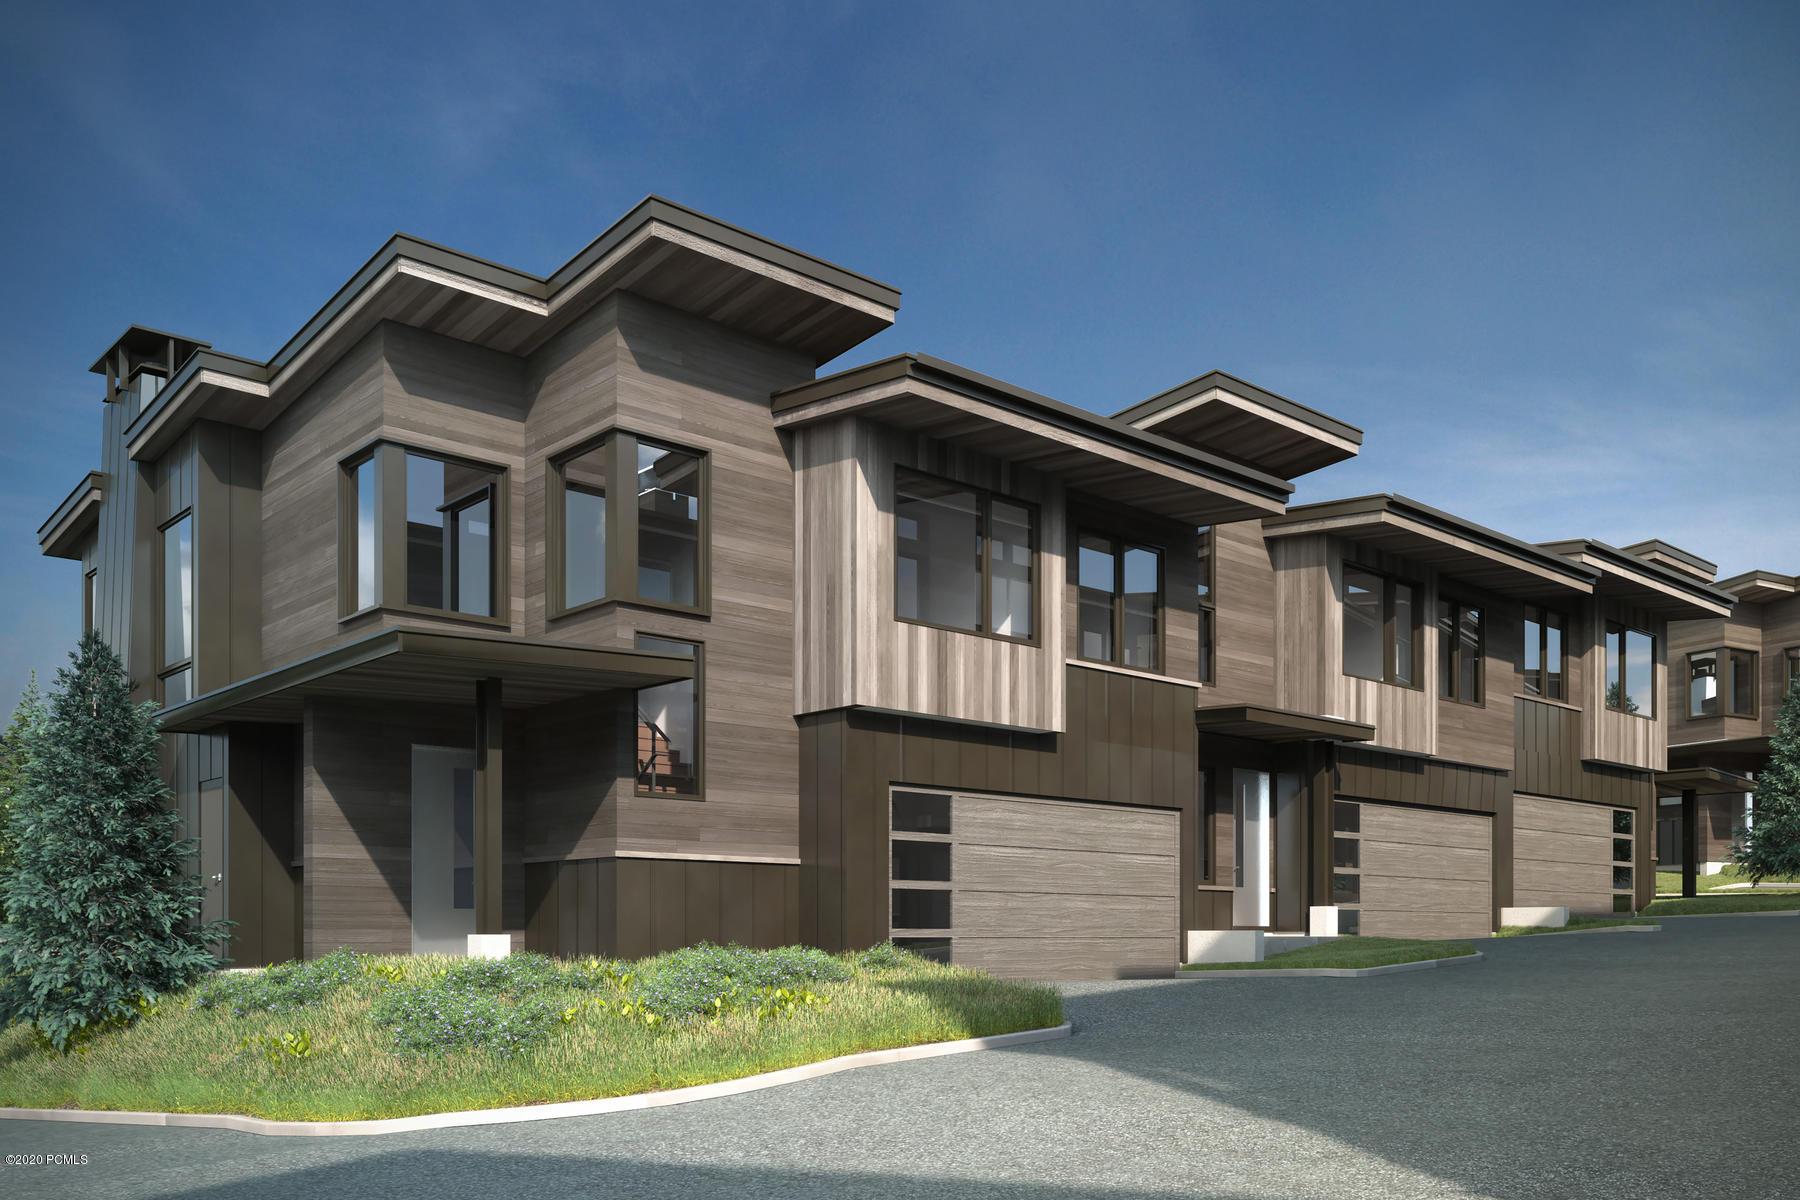 3570 Ridgeline Drive, Park City, Utah 84098, 4 Bedrooms Bedrooms, ,5 BathroomsBathrooms,Condominium,For Sale,Ridgeline,20190109112430415765000000